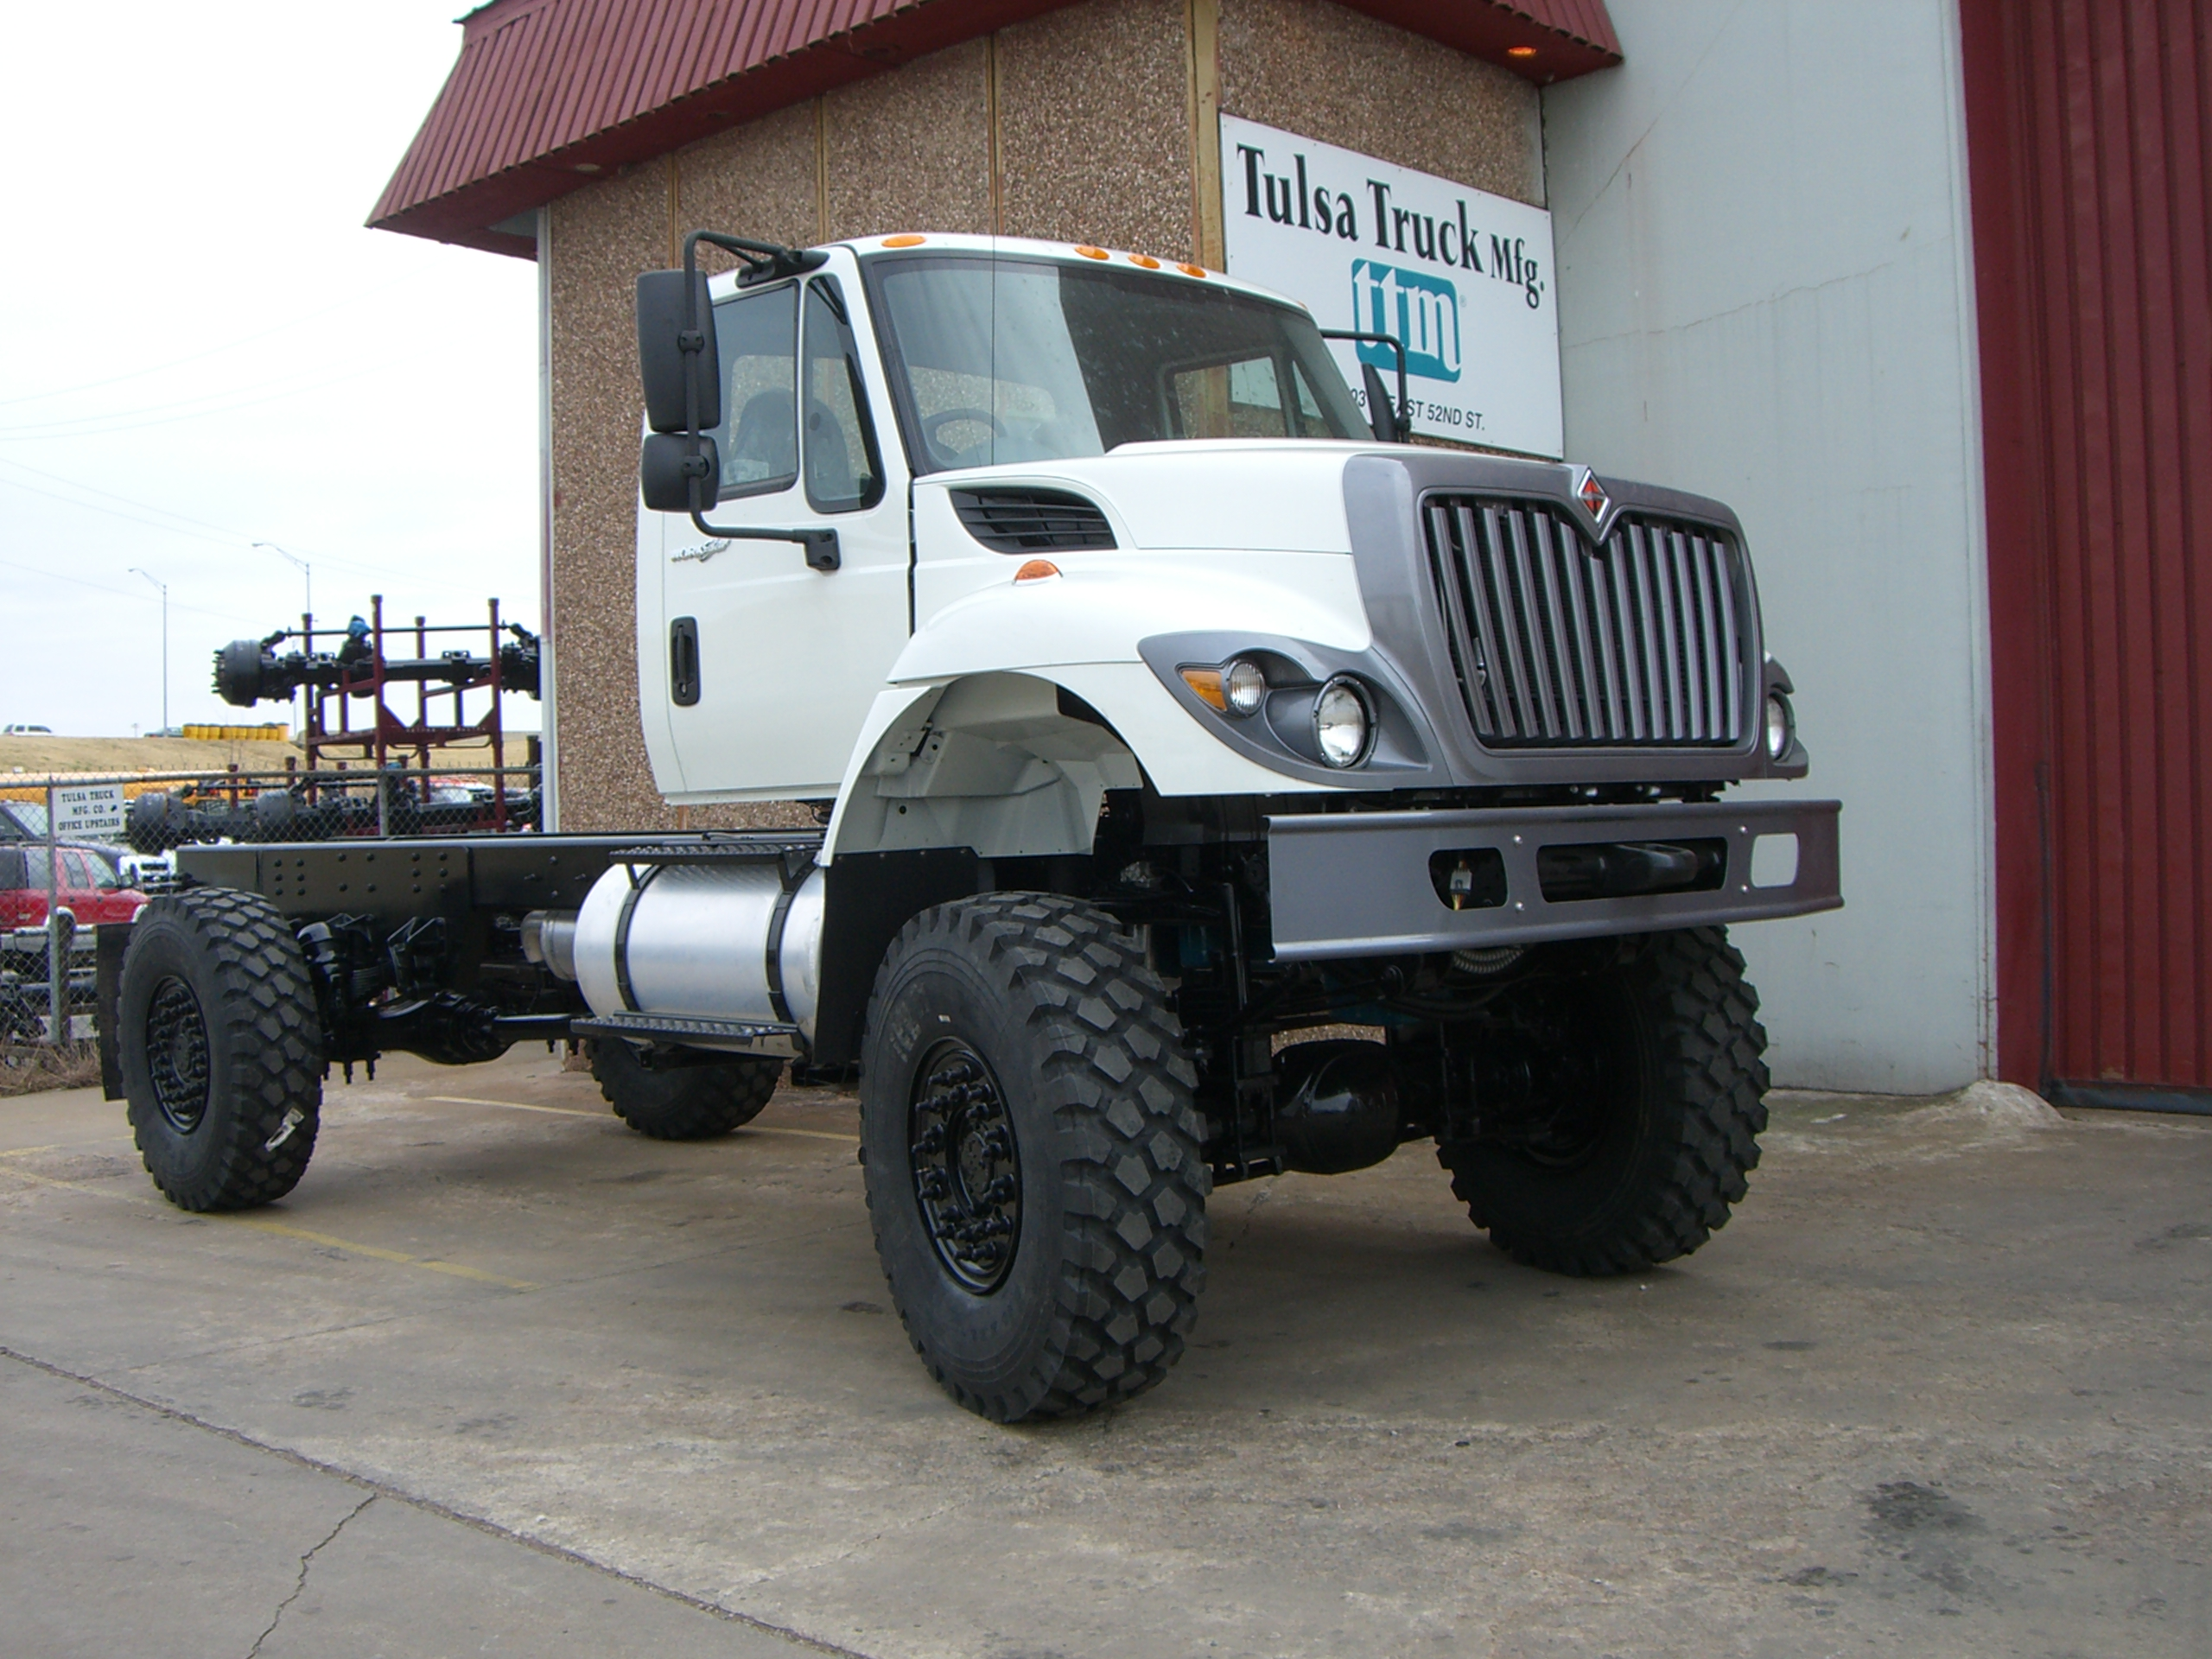 Tulsa Truck Manufacturing